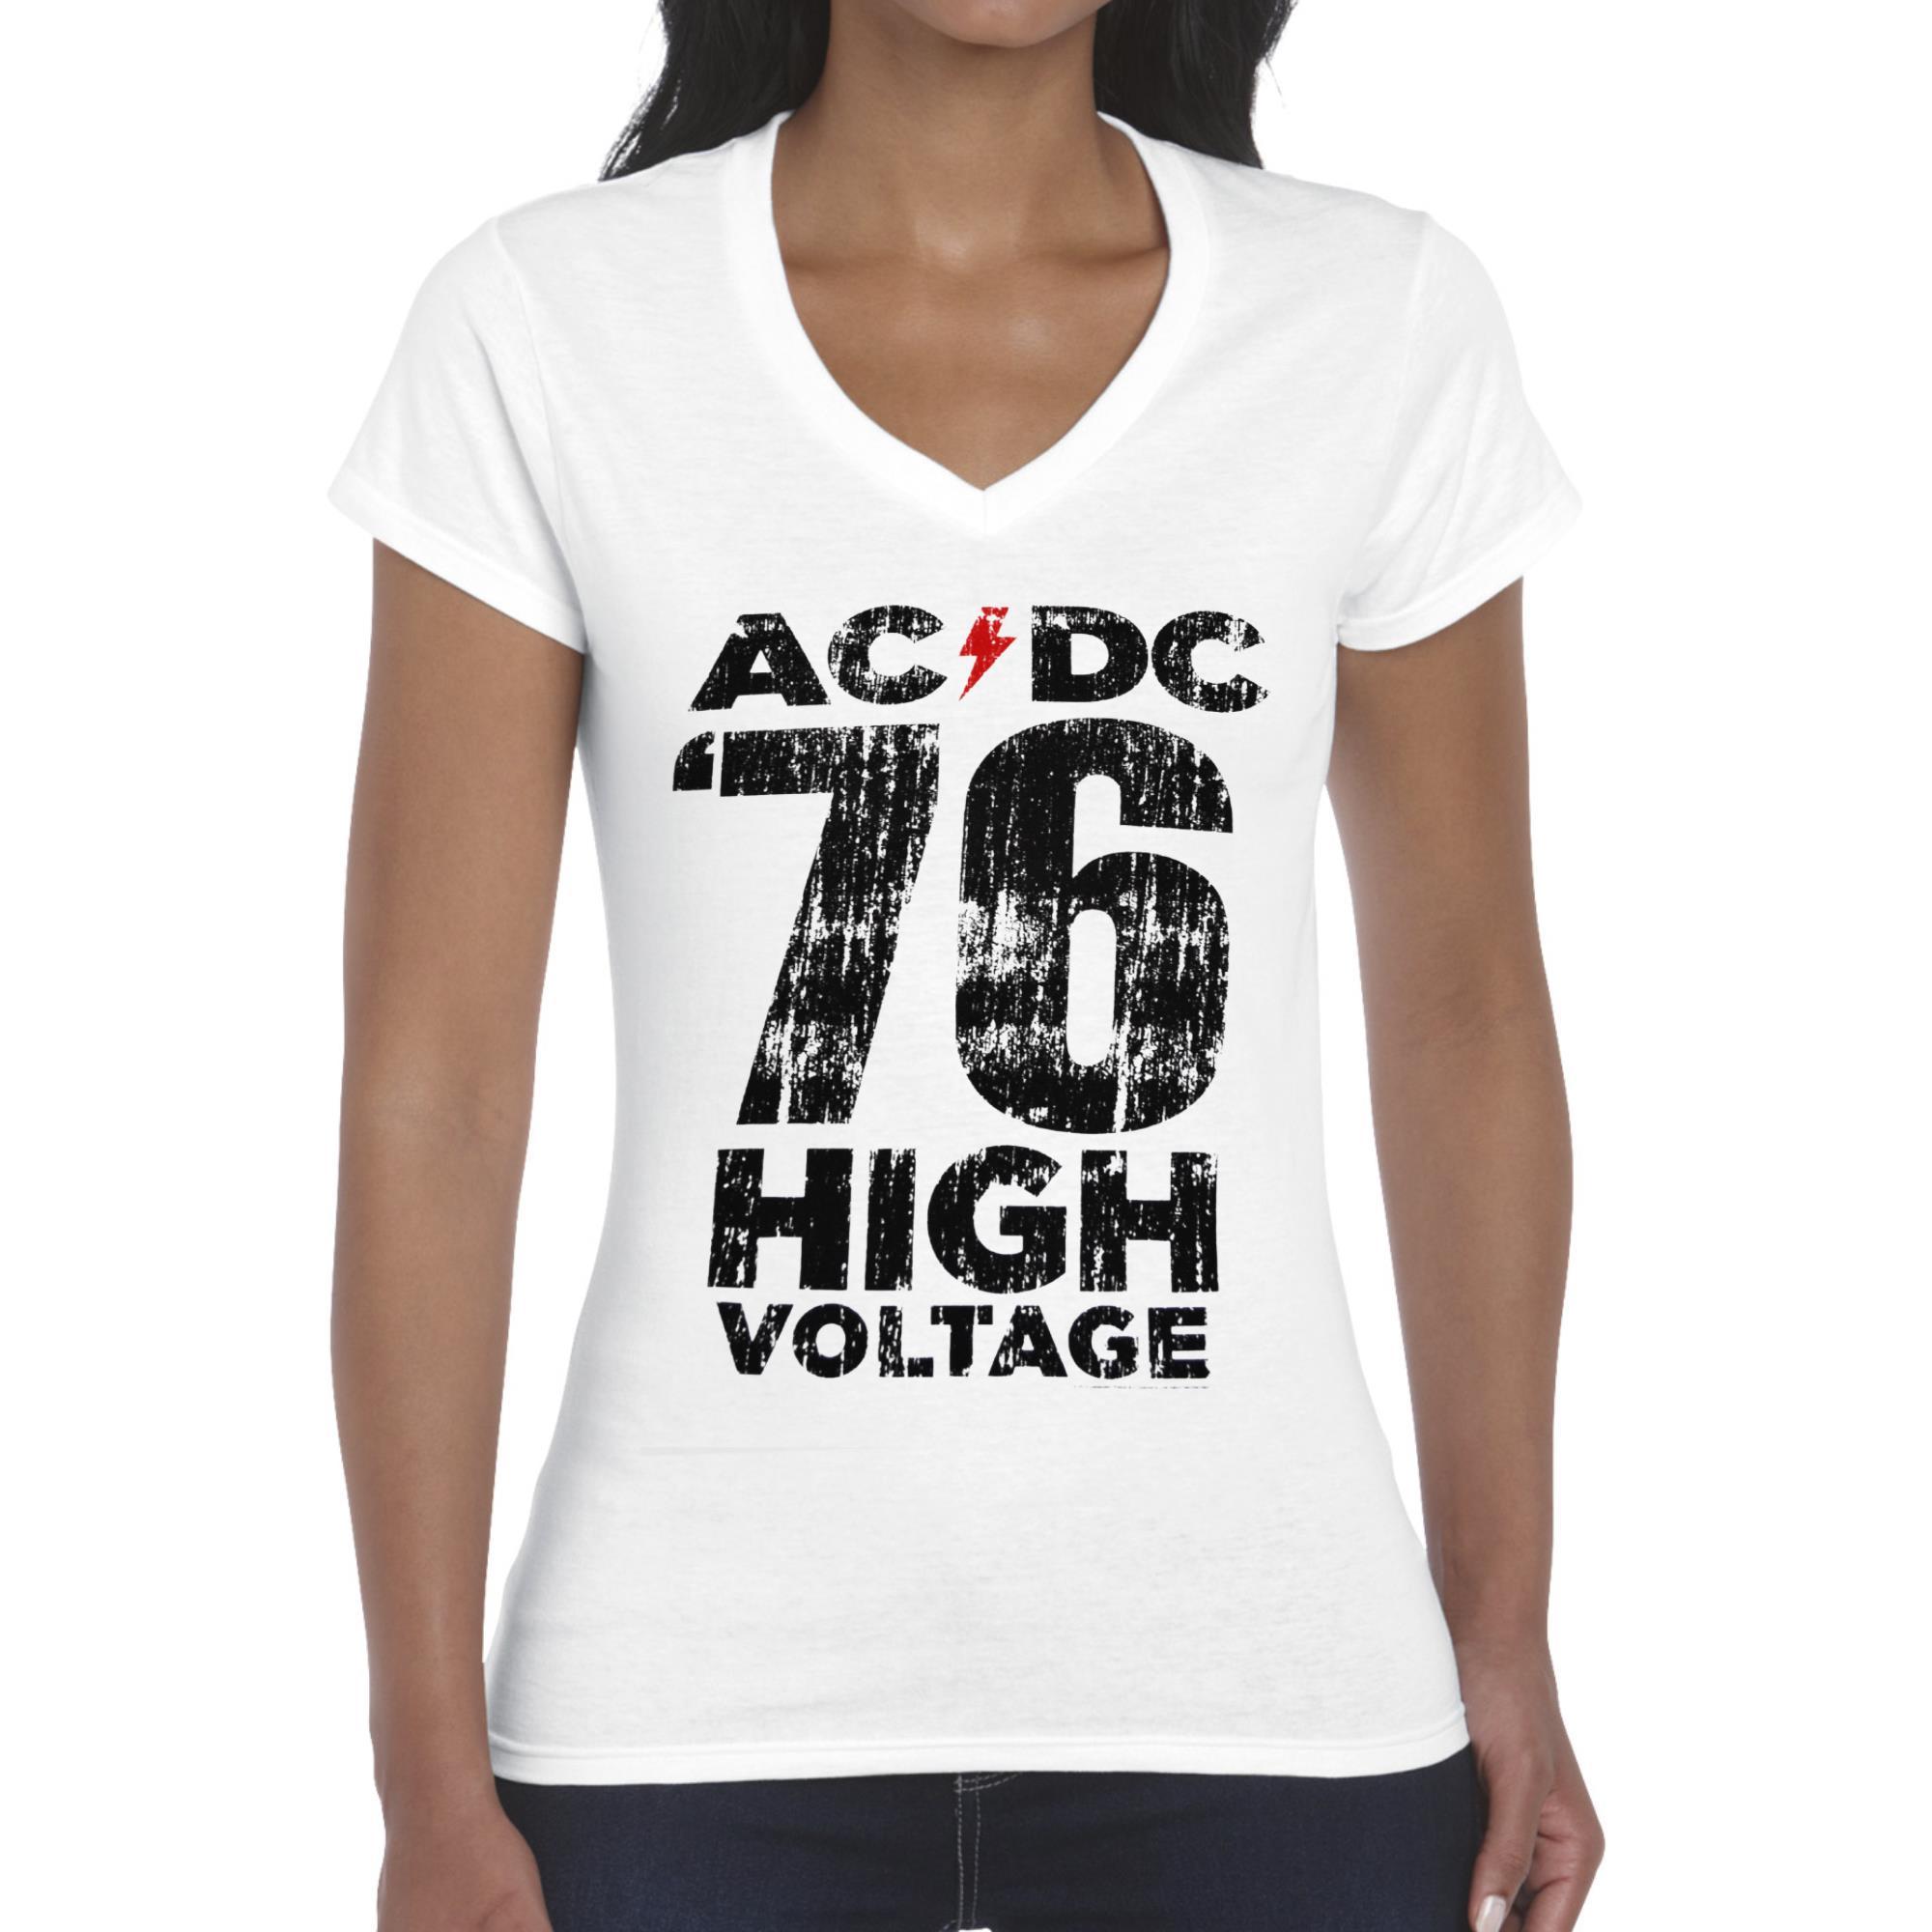 High Voltage V-Neck Shirt